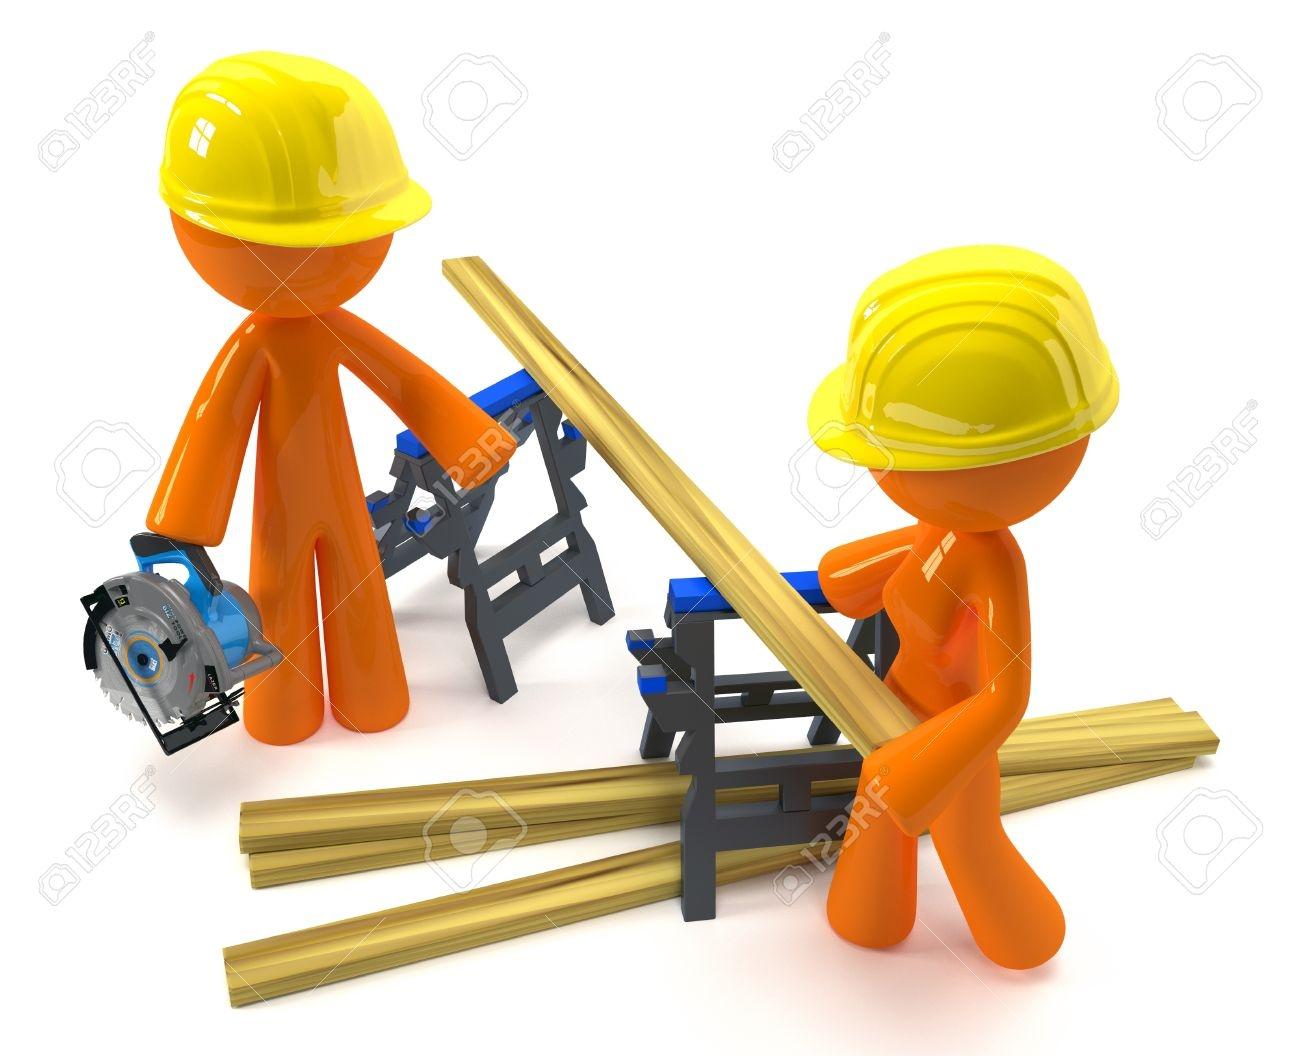 Project management dagny evans. Contractor clipart construction team